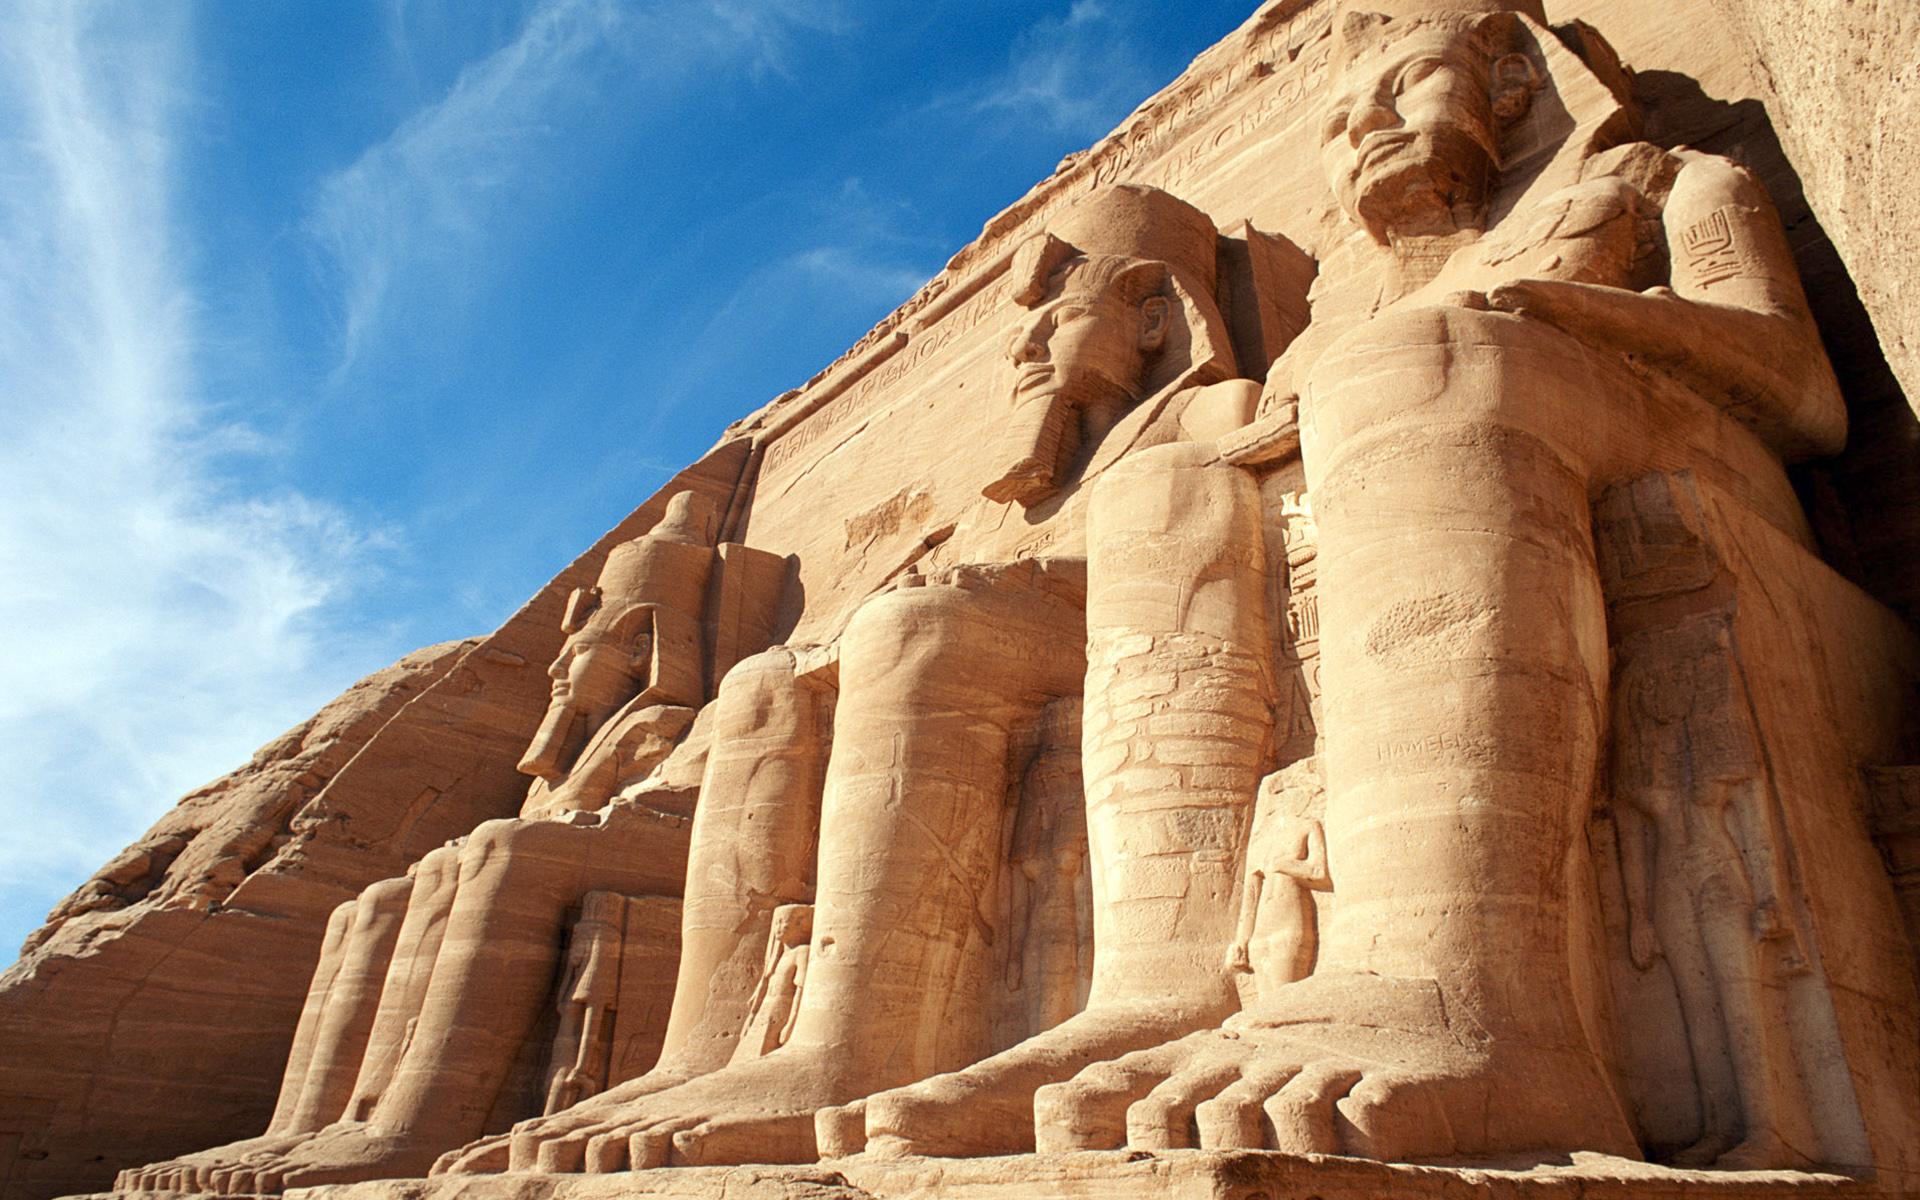 Abu Simbel Temples Egypt - Egypt Wallpaper (34546722) - Fanpop